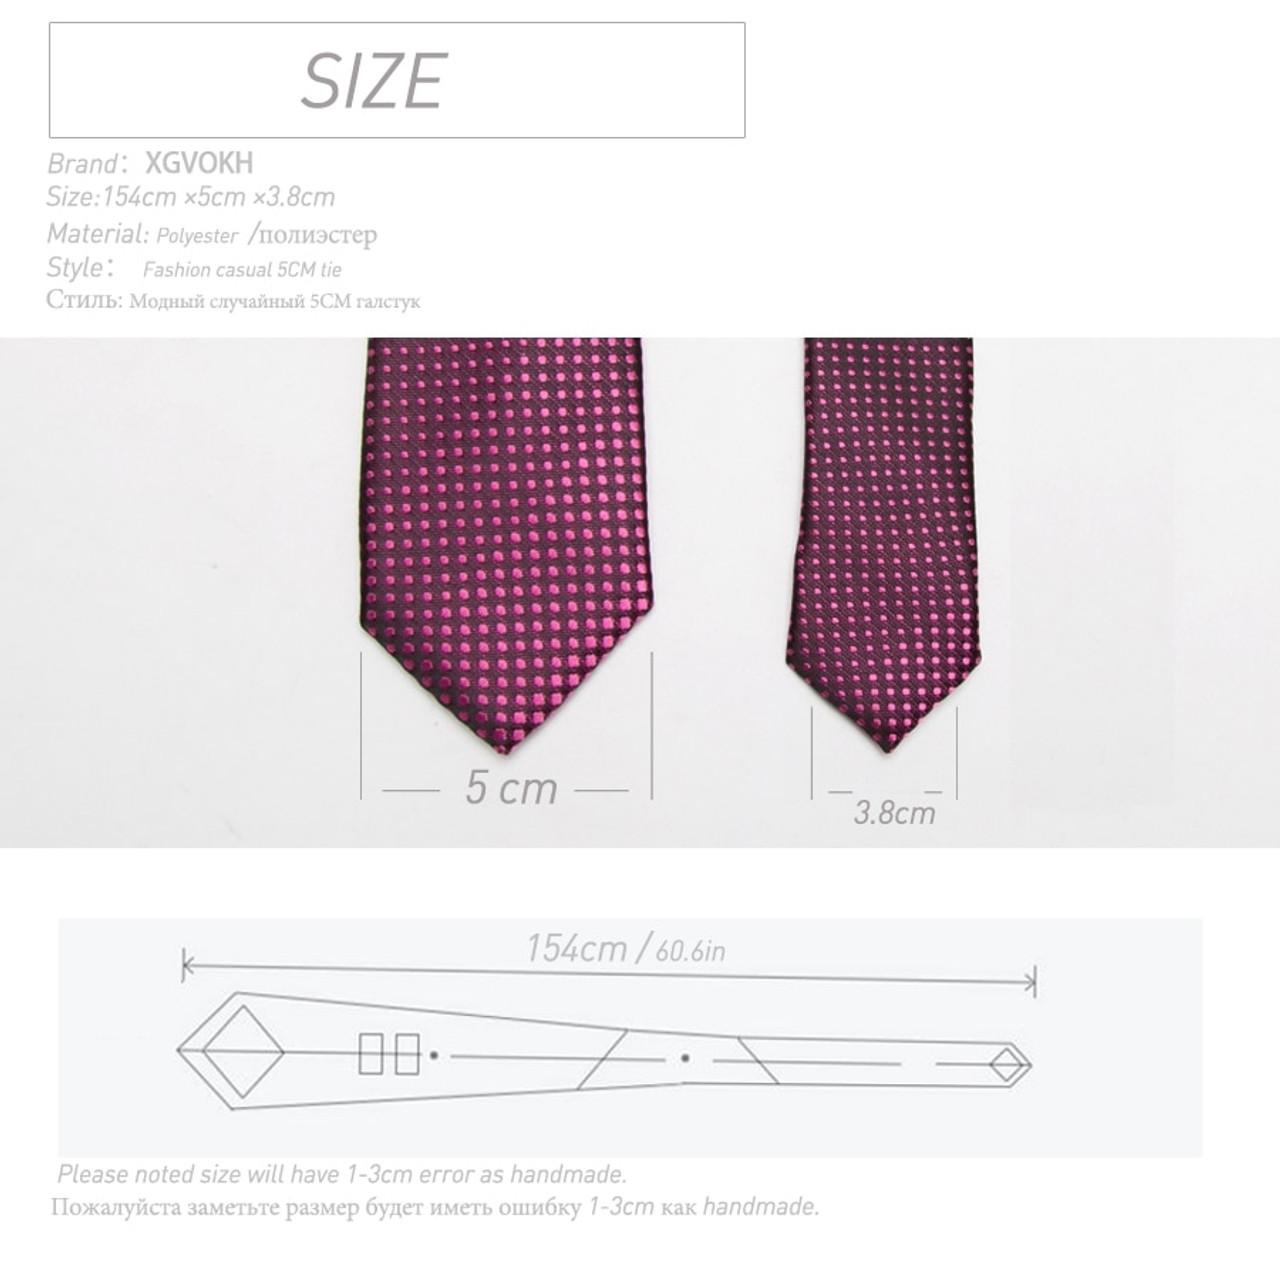 984f1ec8a150 ... Men Tie fashion Mens 5cm Slim ties Striped lattice Neckties Gravata  Jacquard Bowtie man's Wedding dress ...